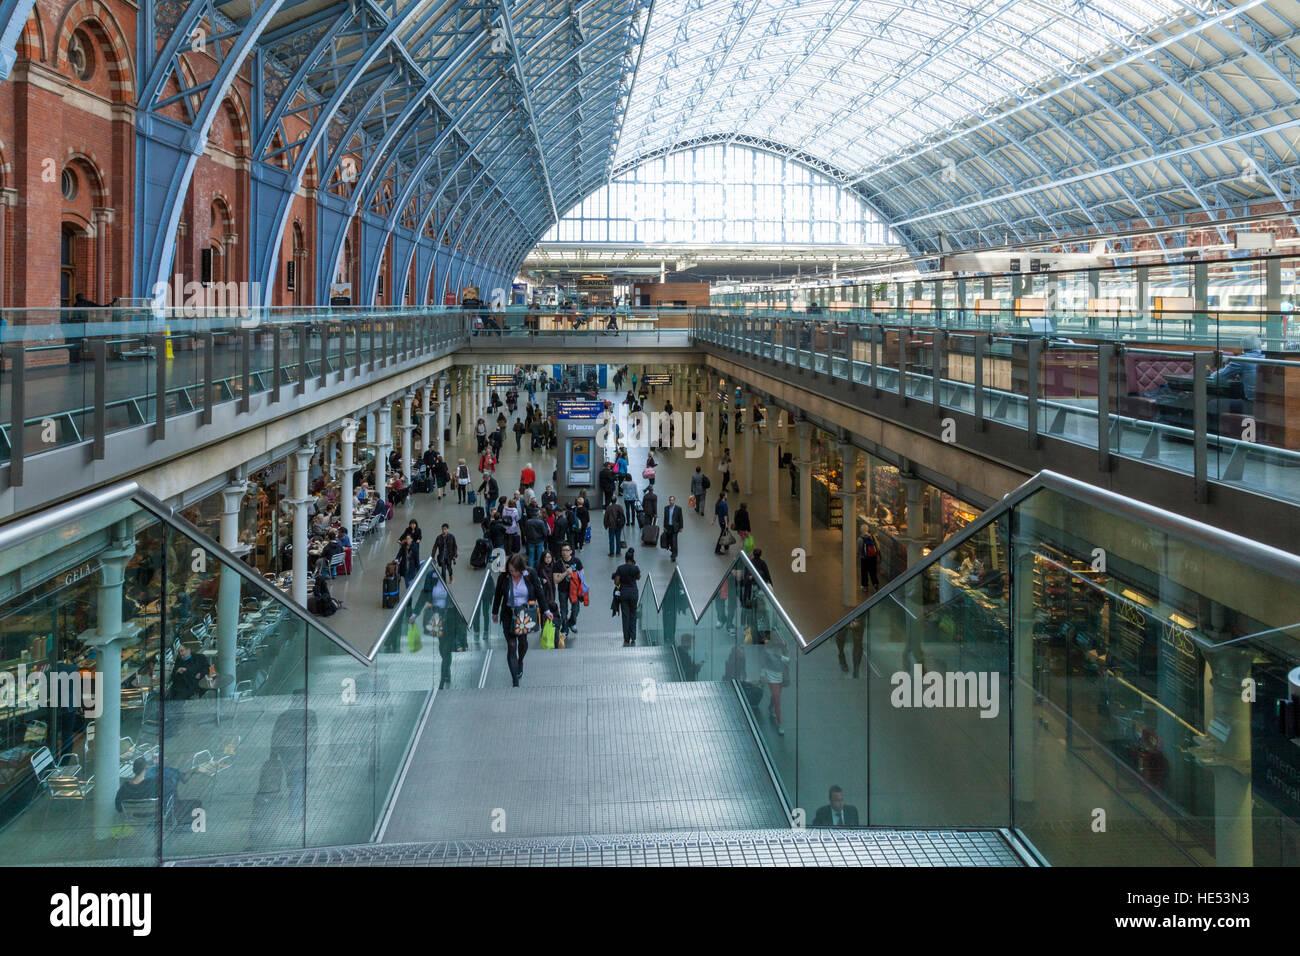 Interior of St Pancras International Train Station, London, UK - Stock Image